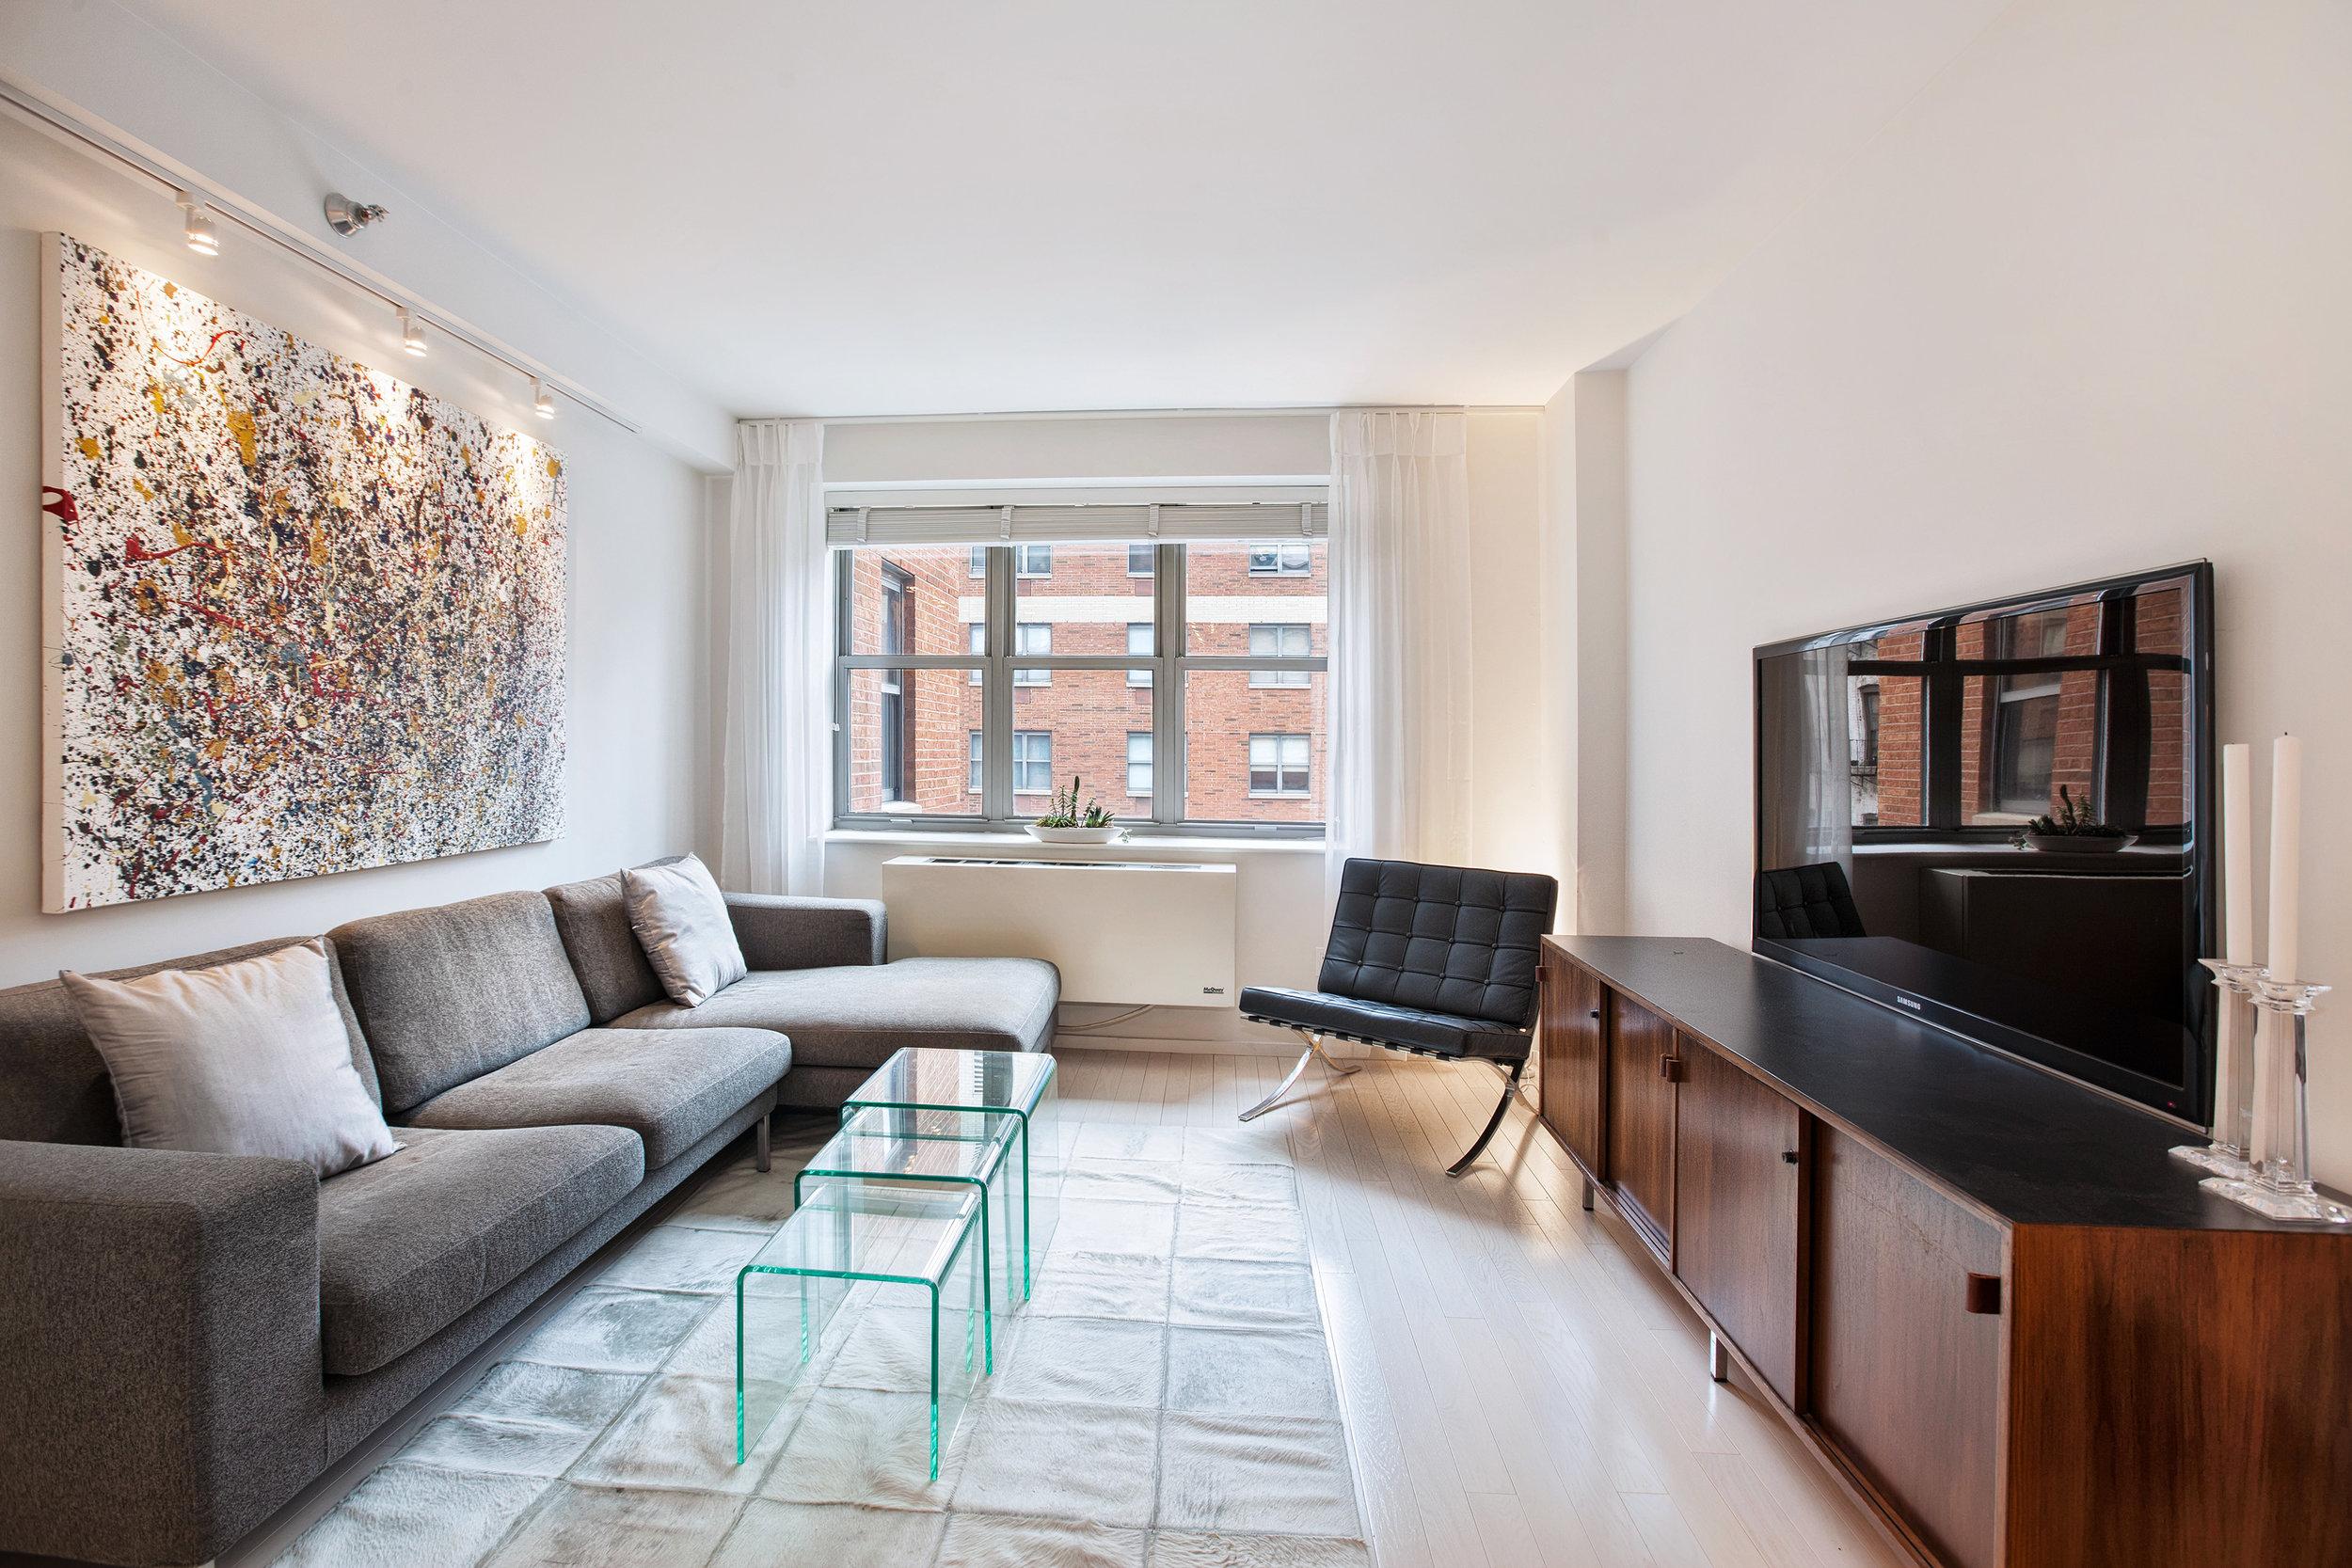 516 West 47th Street, #N5H - $835,000